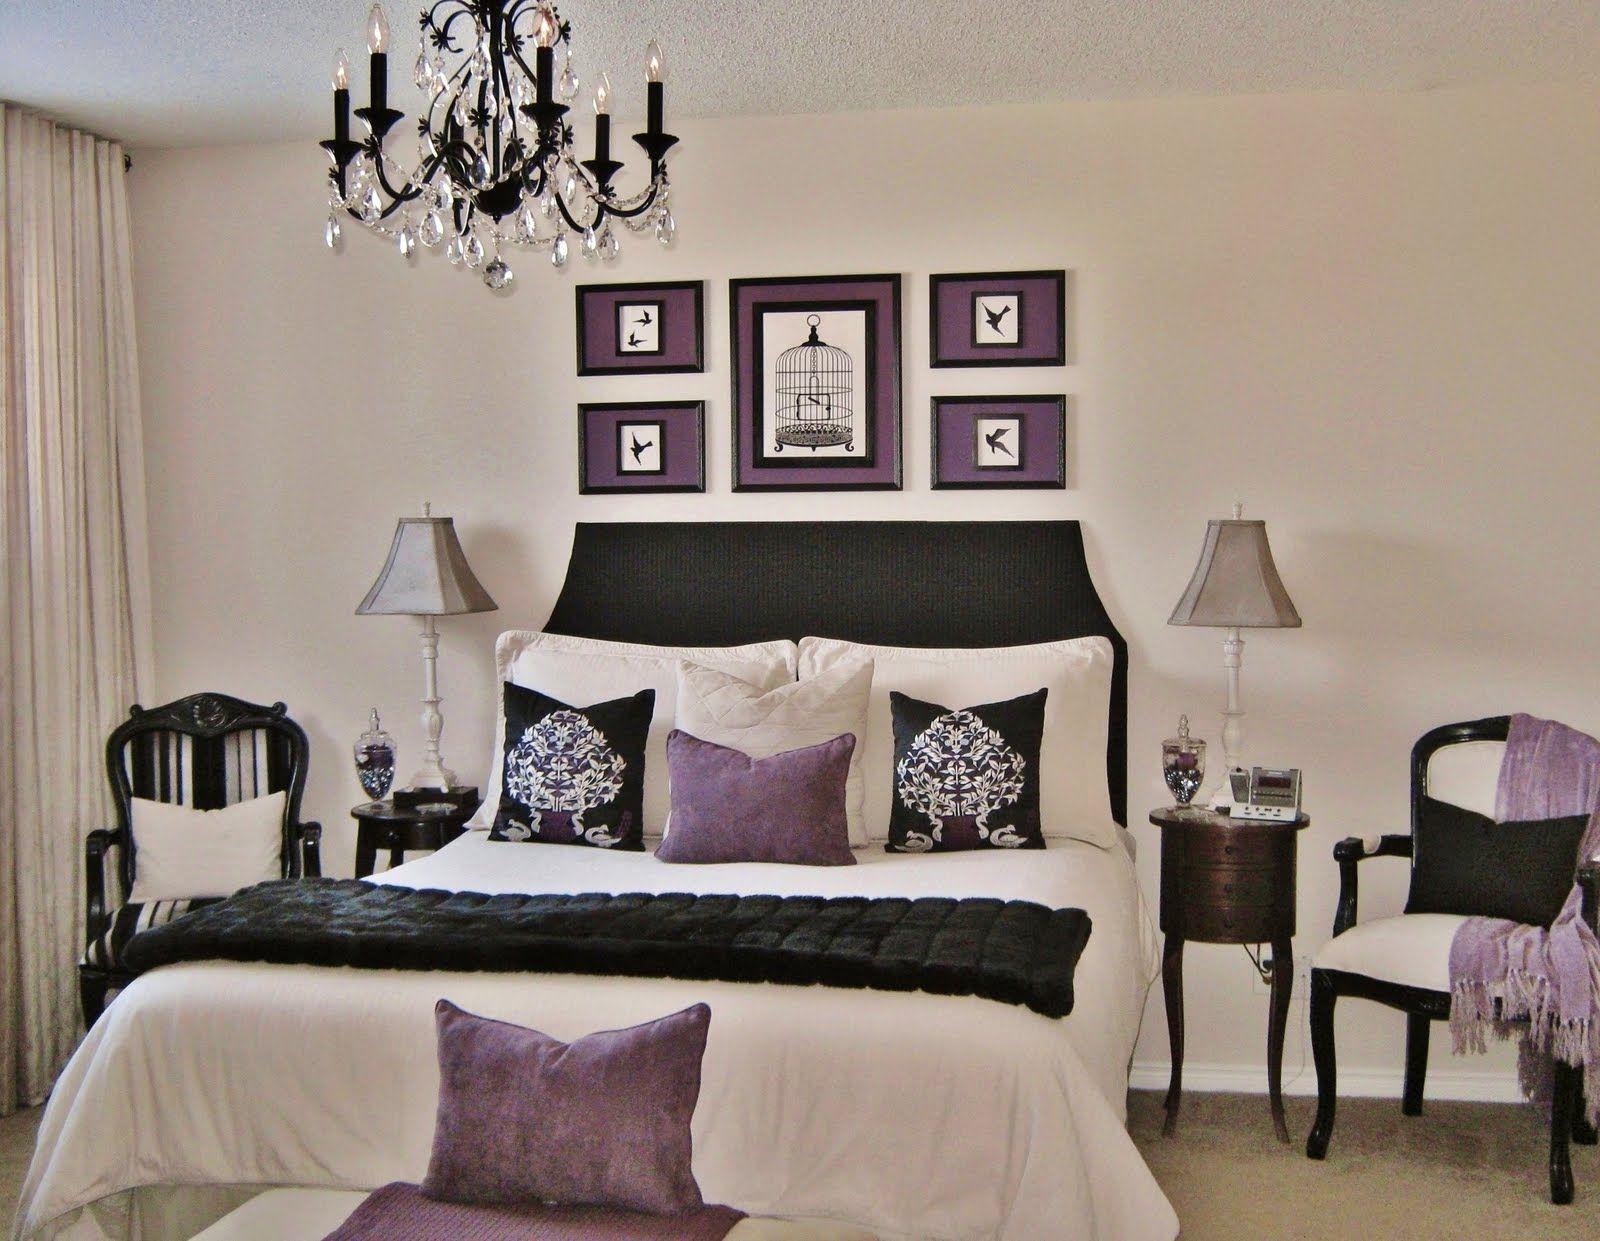 decoration for bedrooms ideas bedroom purple urban chic decor decorate bedroom ideas bedroom decoration for bedroom walls clever kids